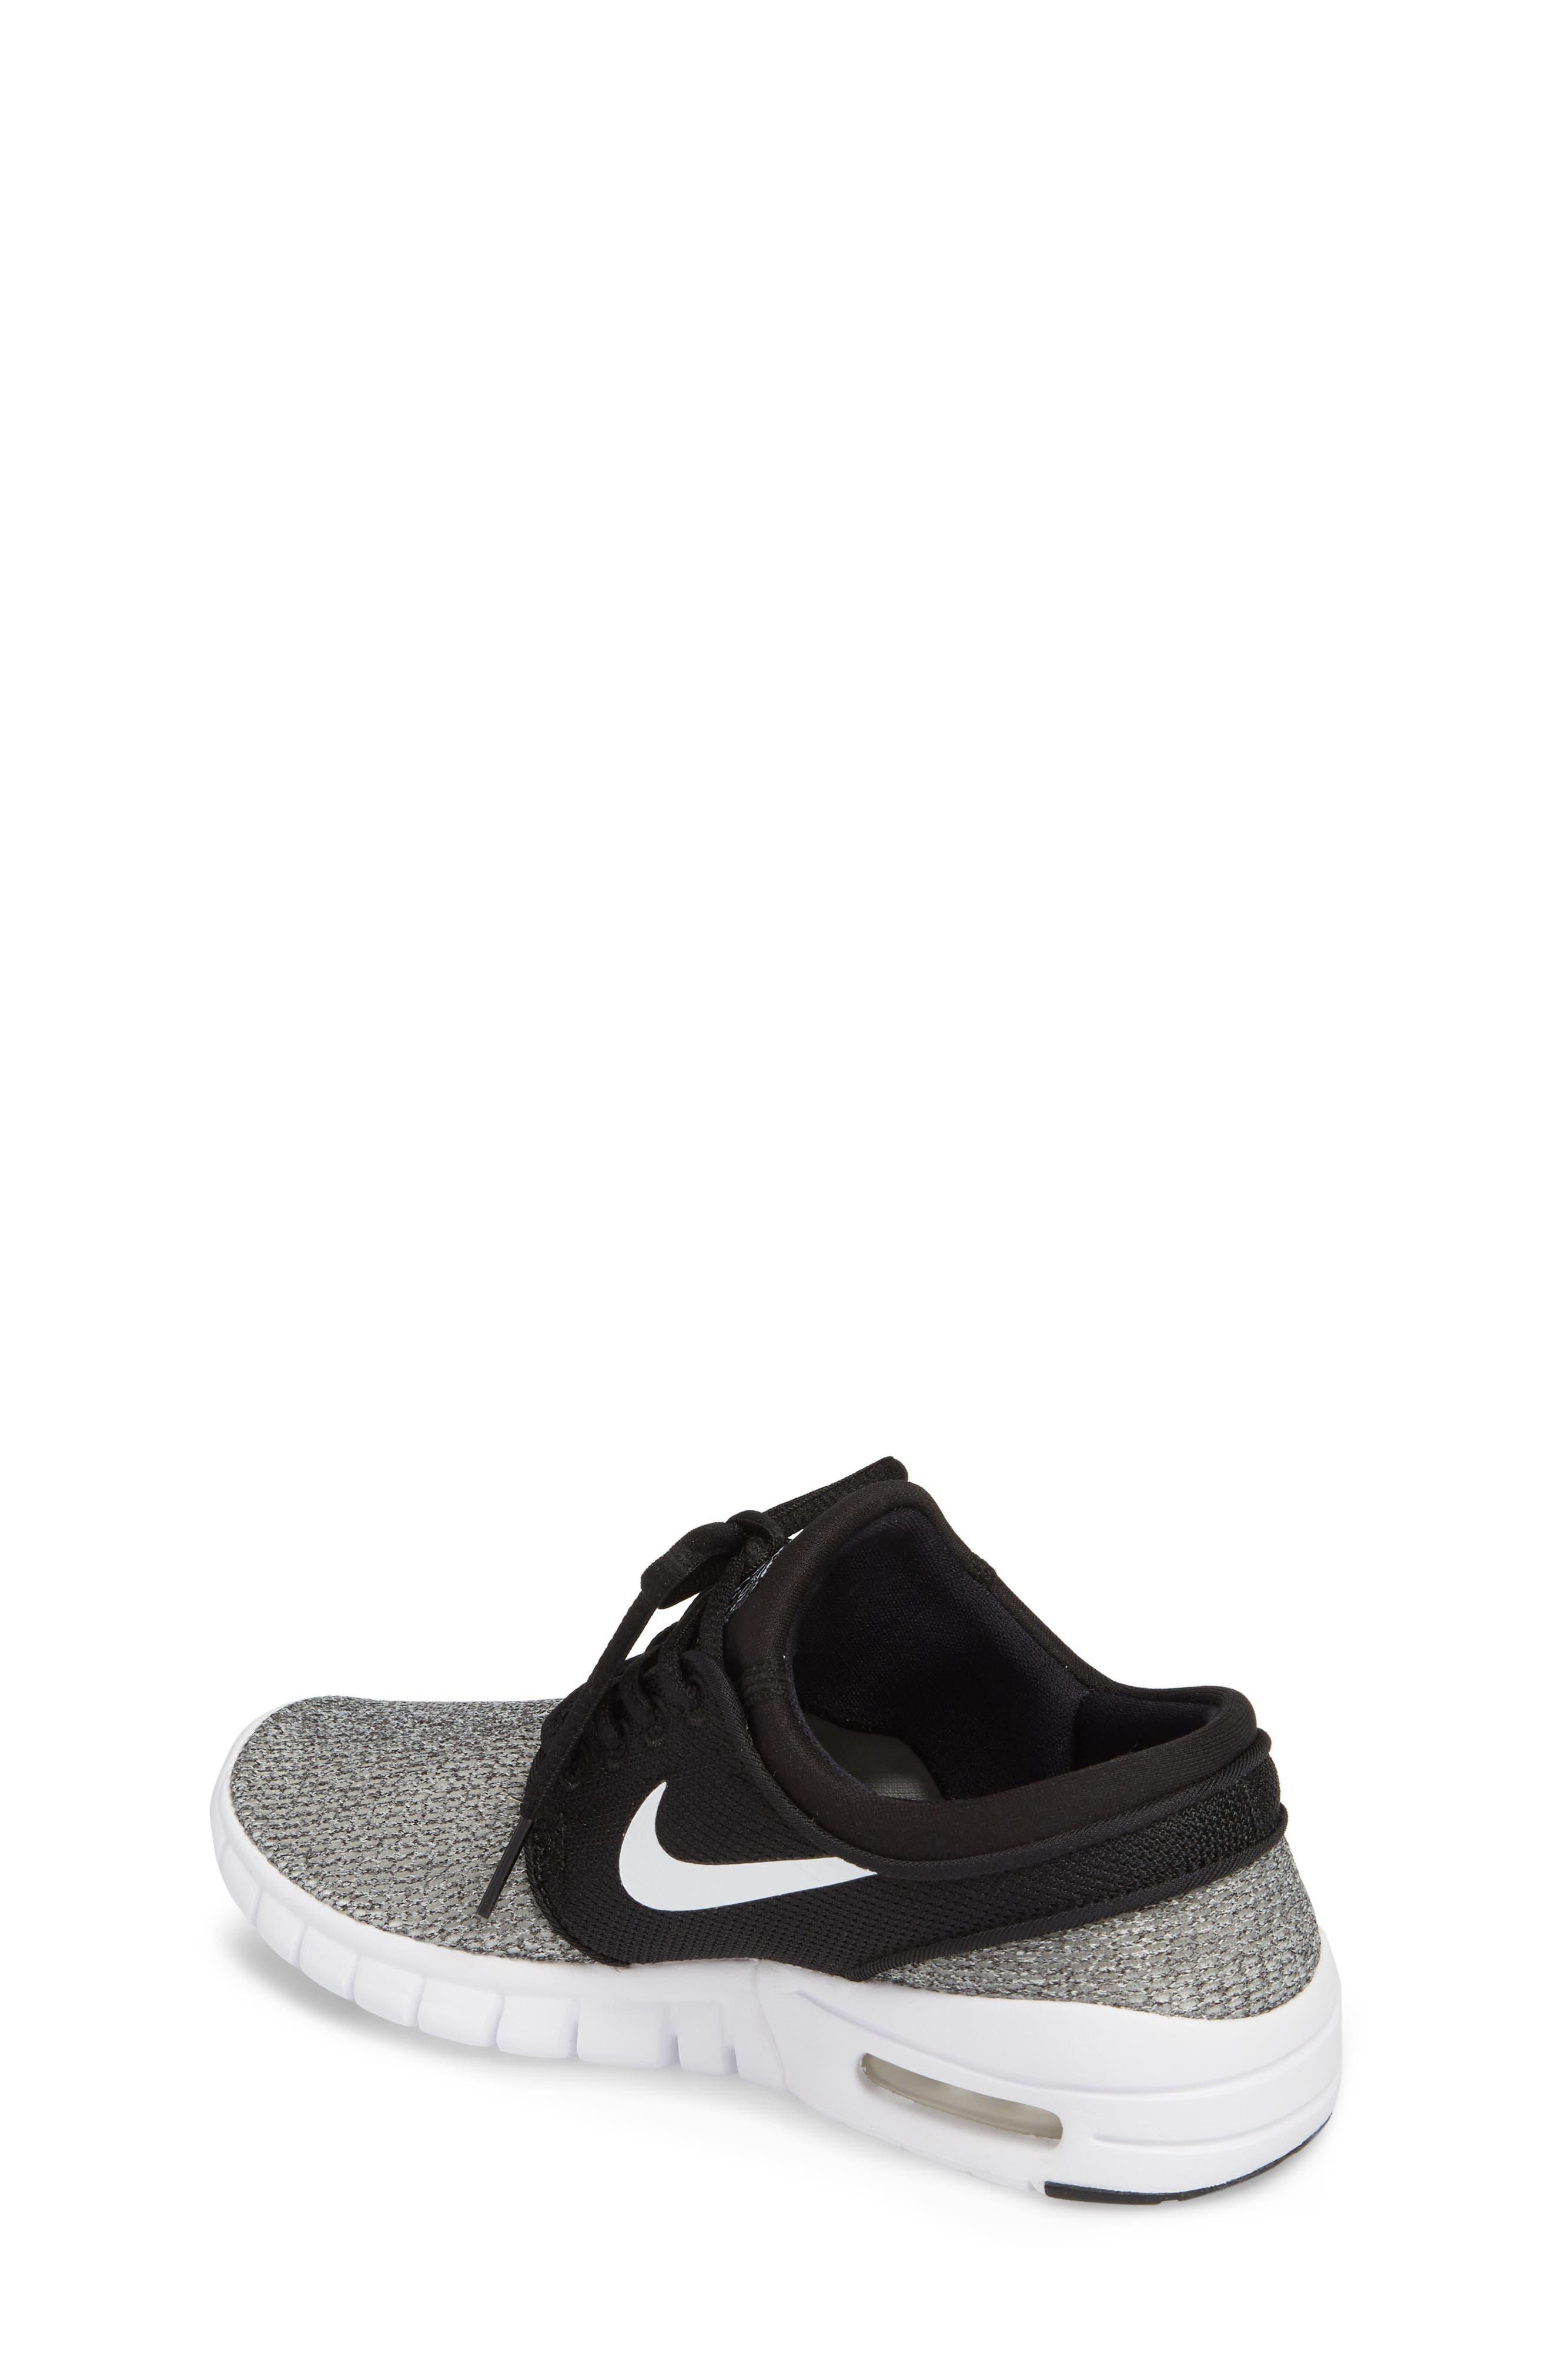 Stefan Janoski Max SB Skate Sneaker,                             Alternate thumbnail 2, color,                             Black/ White/ White